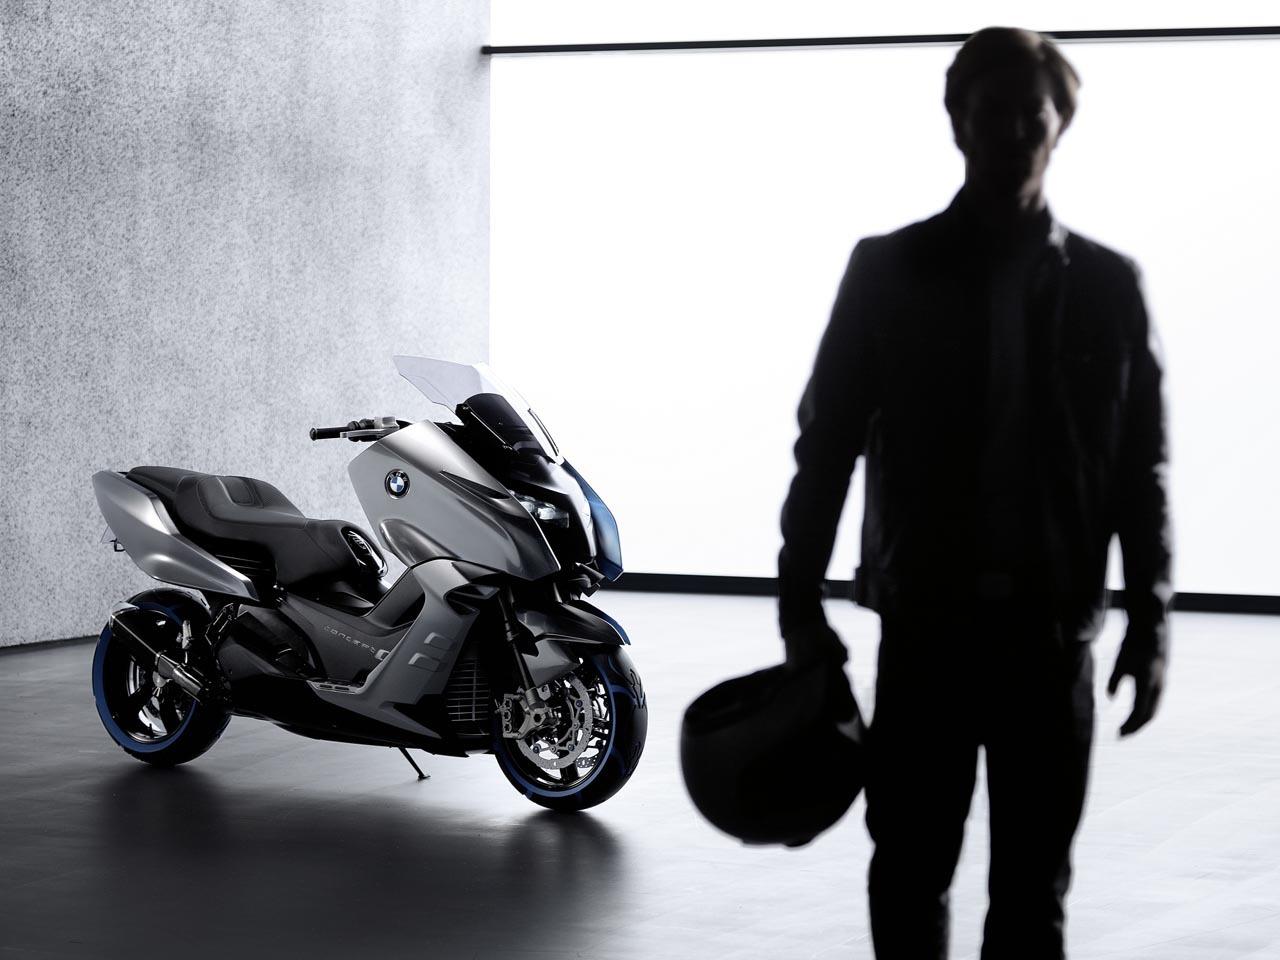 Foto de BMW Concept C Scooter, el Scooter del futuro según BMW (10/19)